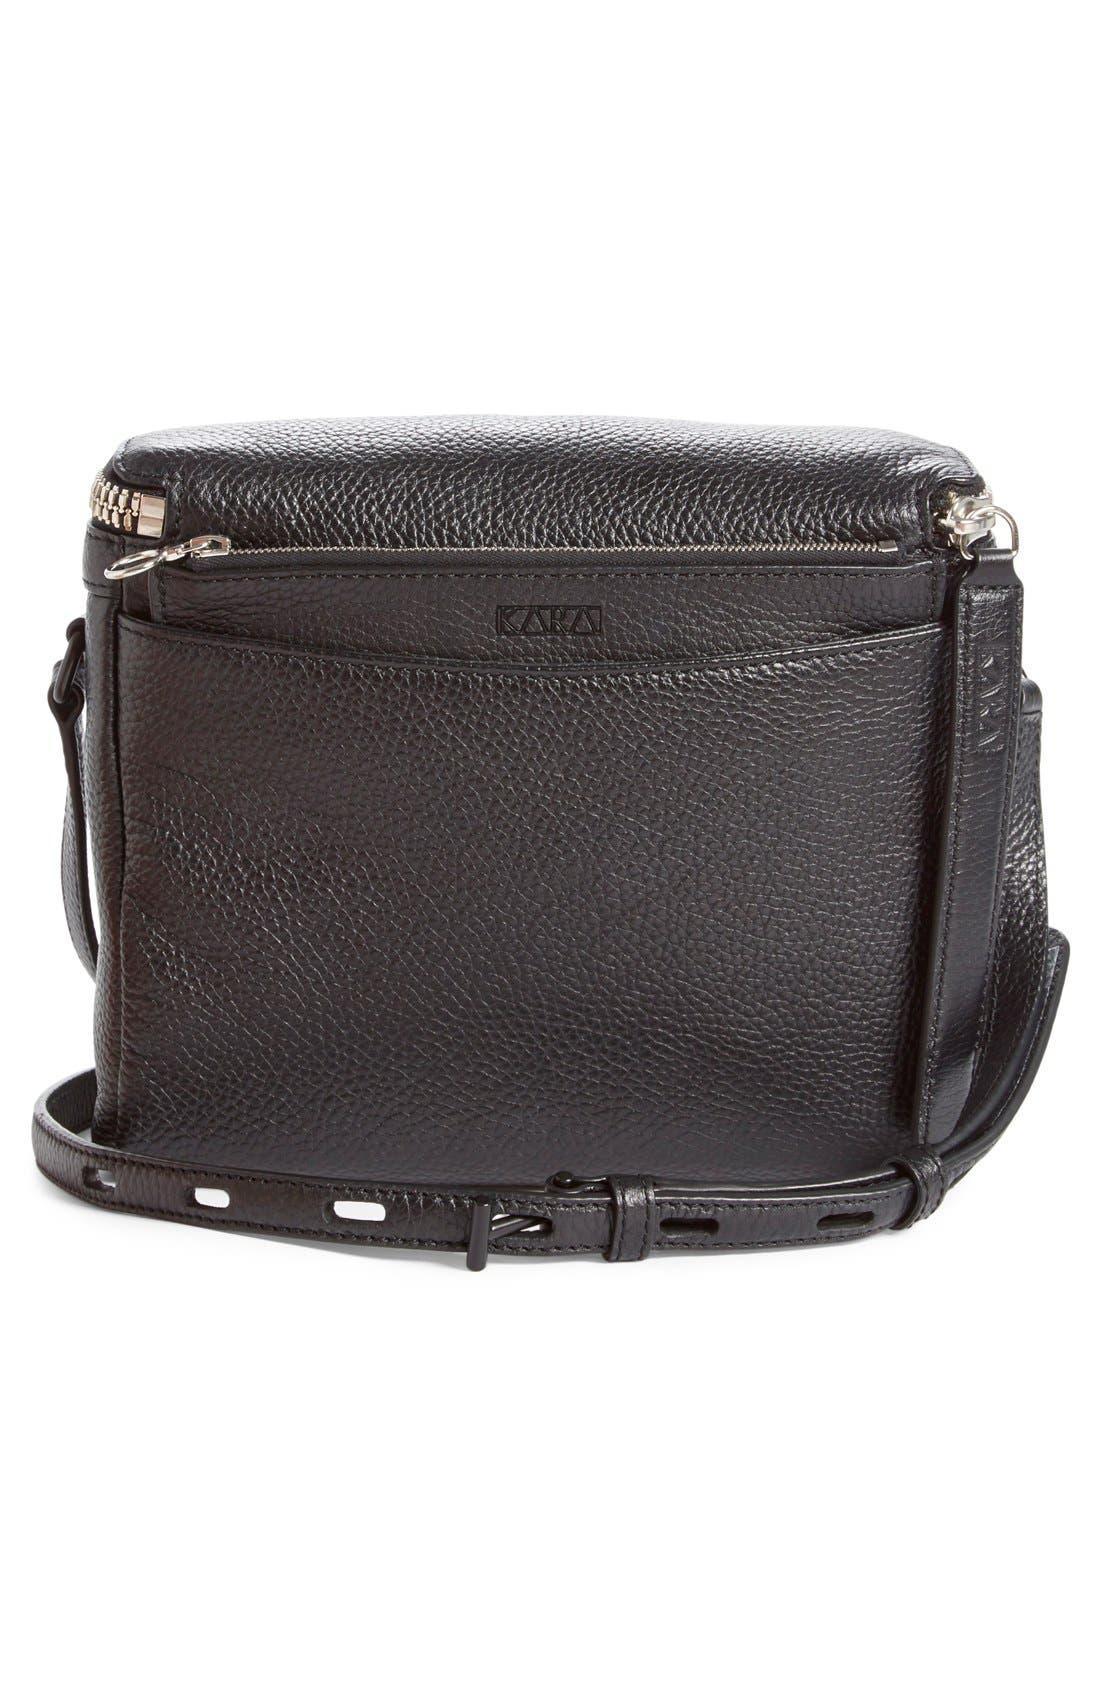 Alternate Image 3  - KARA Large Stowaway Leather Crossbody Bag